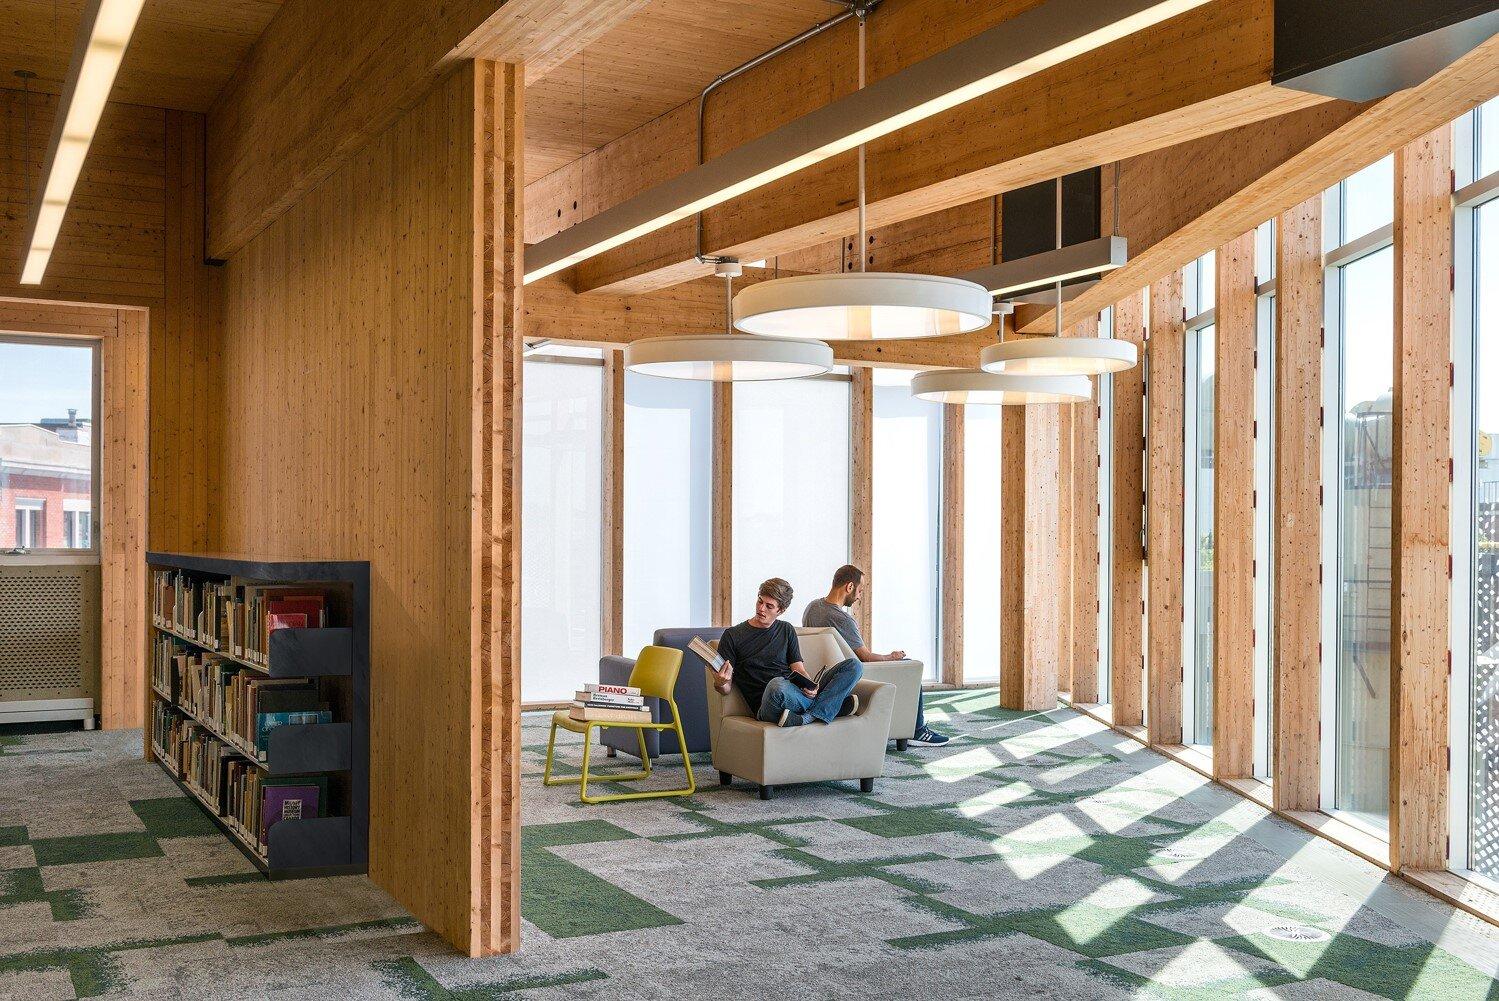 Laurentian University McEwen School of Architecture. Photo credit: Bob Gundu/LGA Architectural